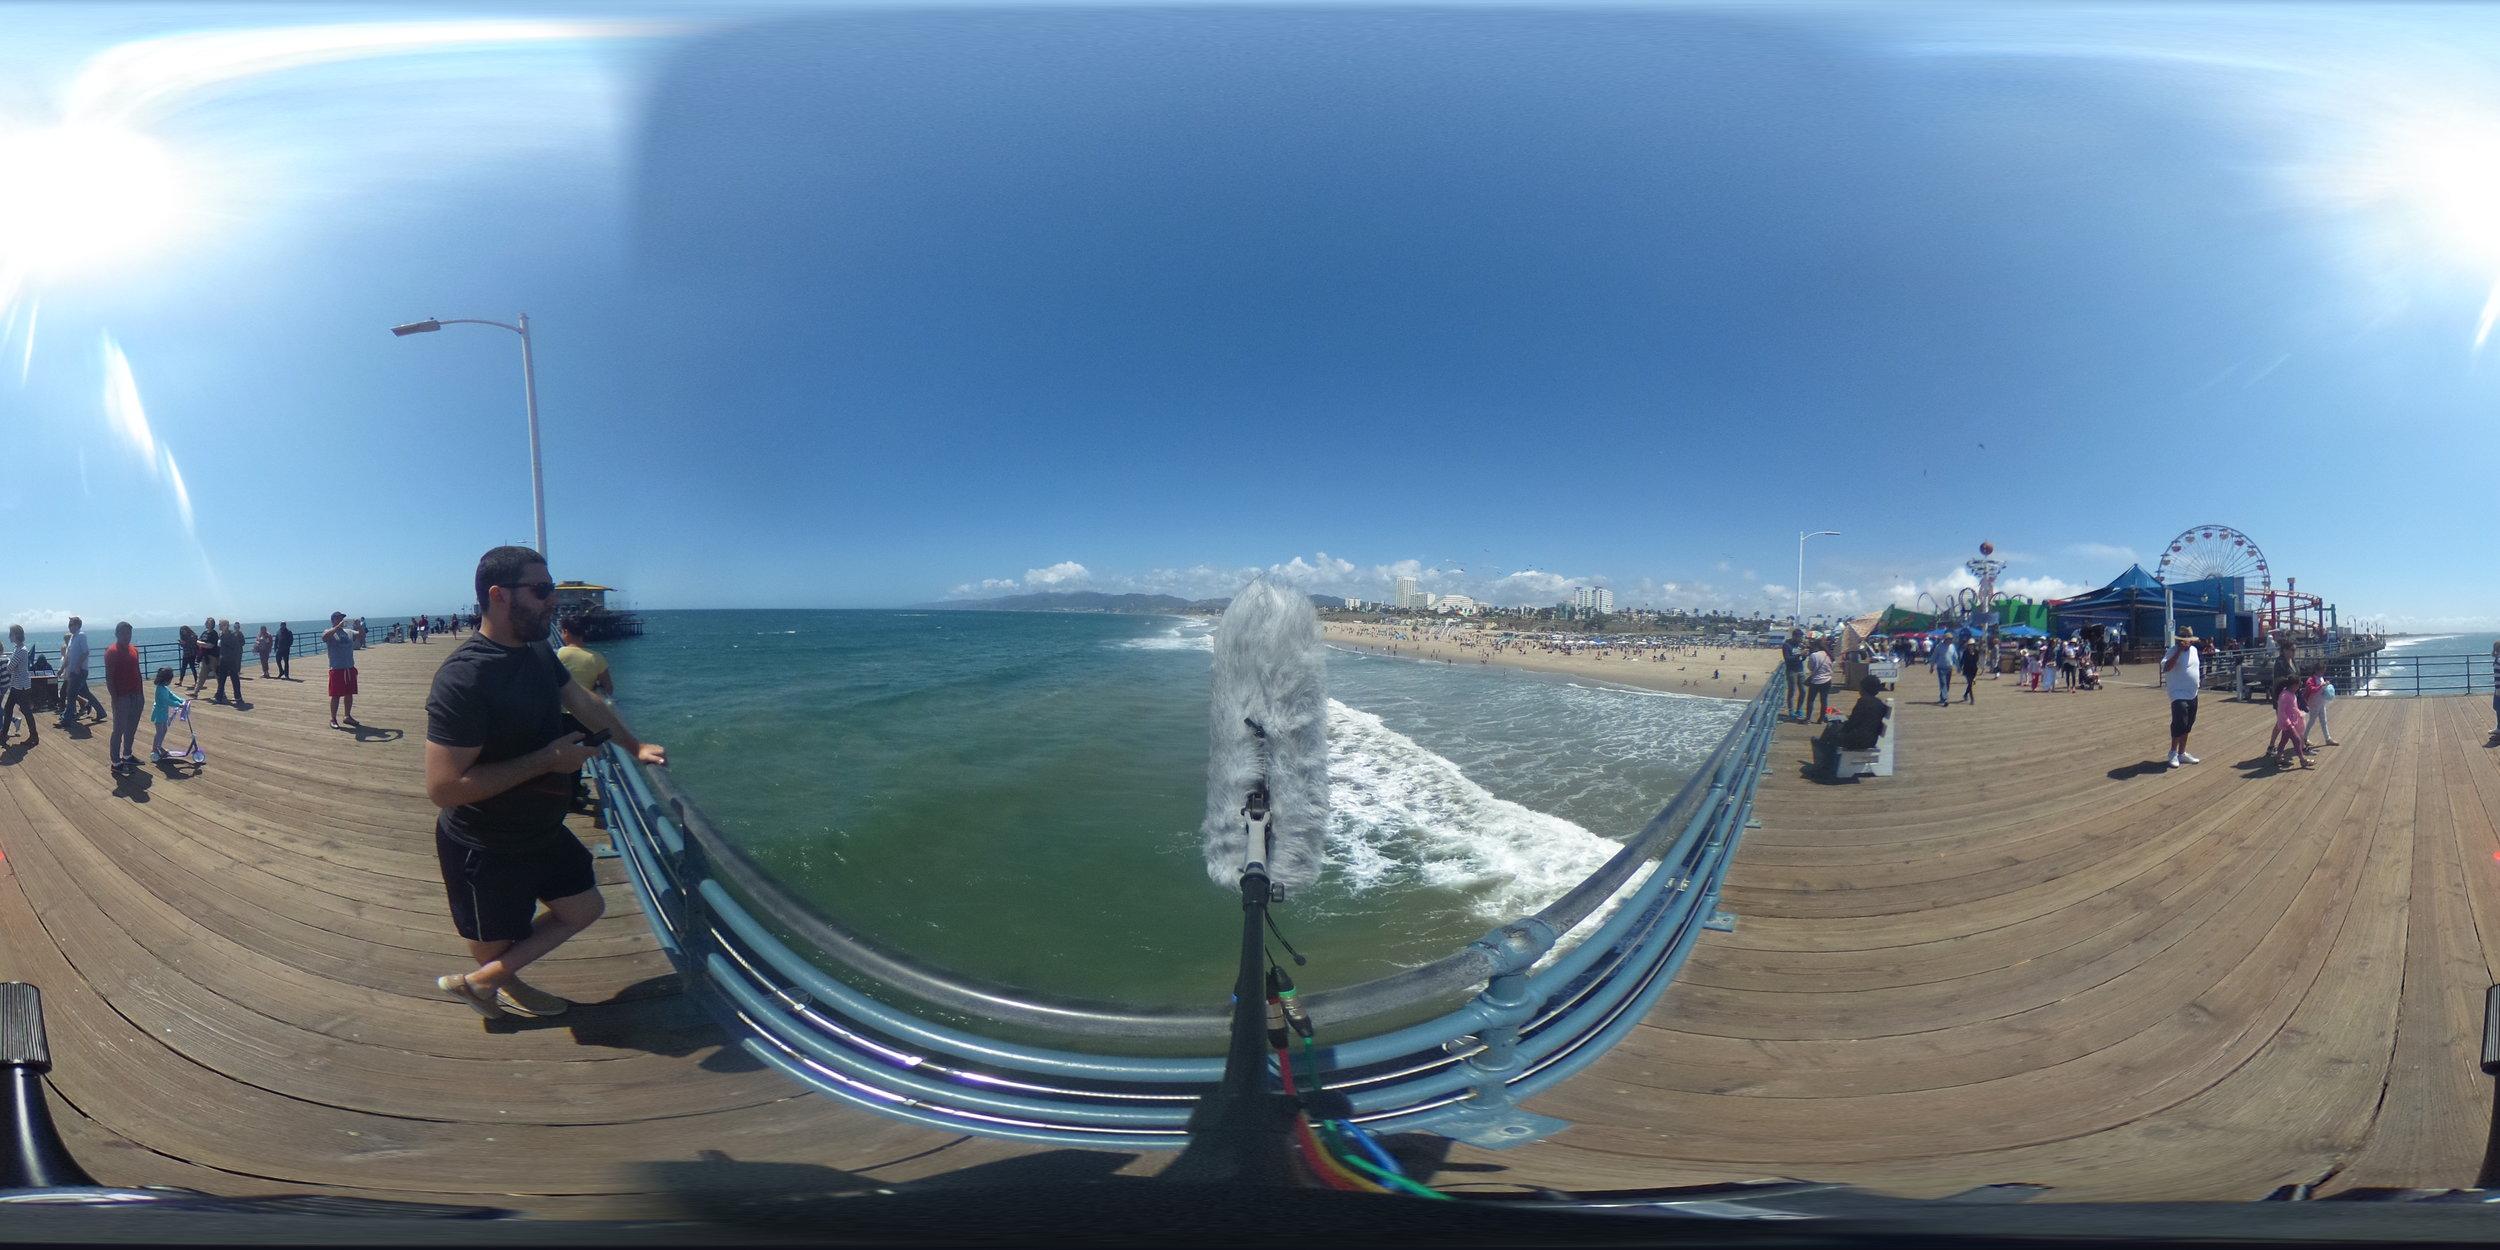 EXT_Day_Beach_Pier_SteadyWavesBelow_SteadWalla_PedestriansPassingBy_DistantMusicOnRadio_DistantAmusementParkRides_JPEG.JPG